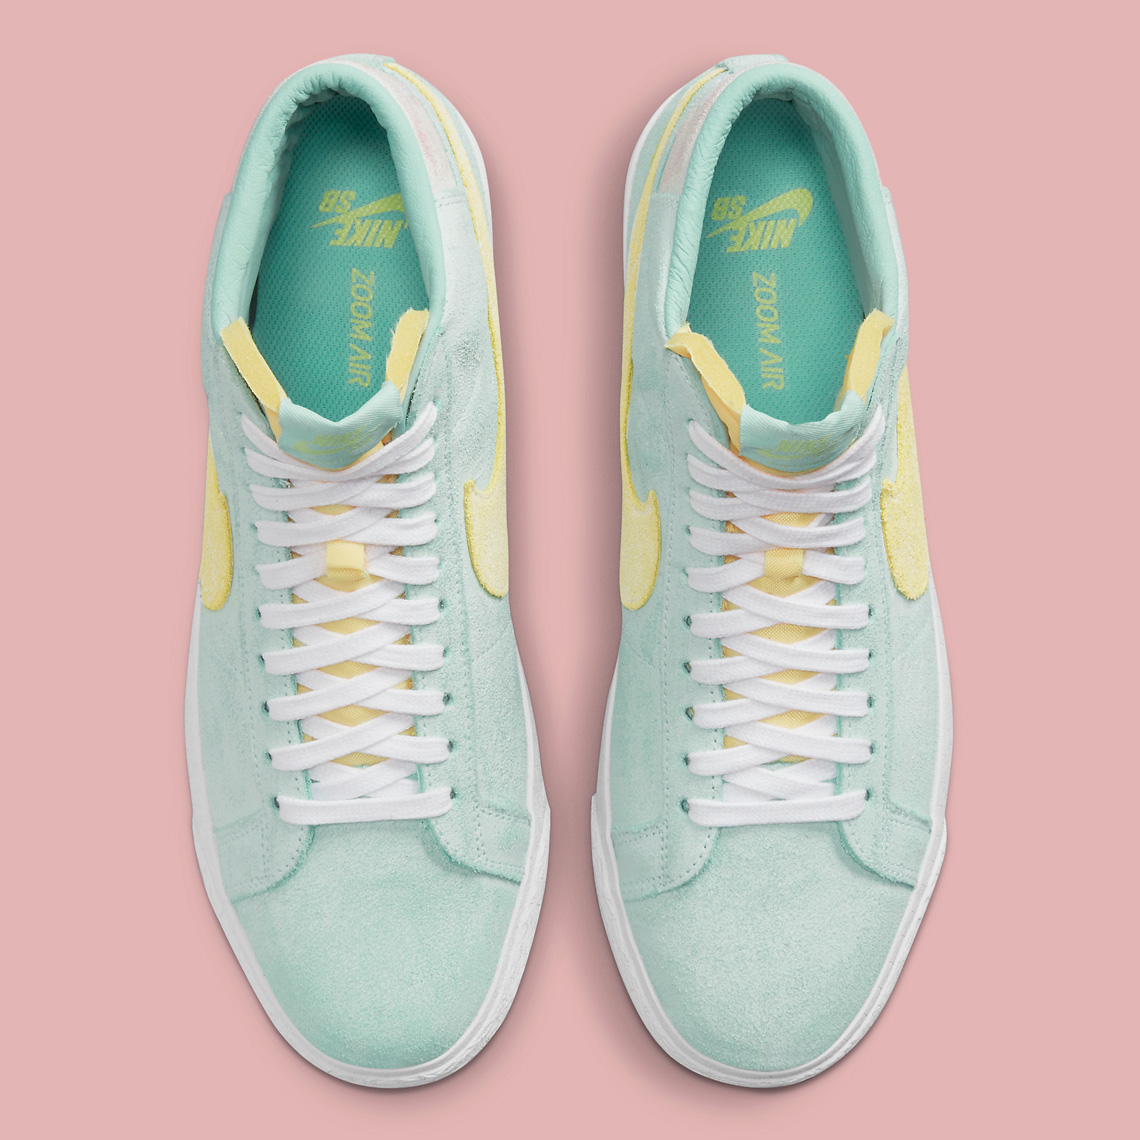 Nike-SB-Blazer-Mid-DA1839-300-08.jpg?w=1140